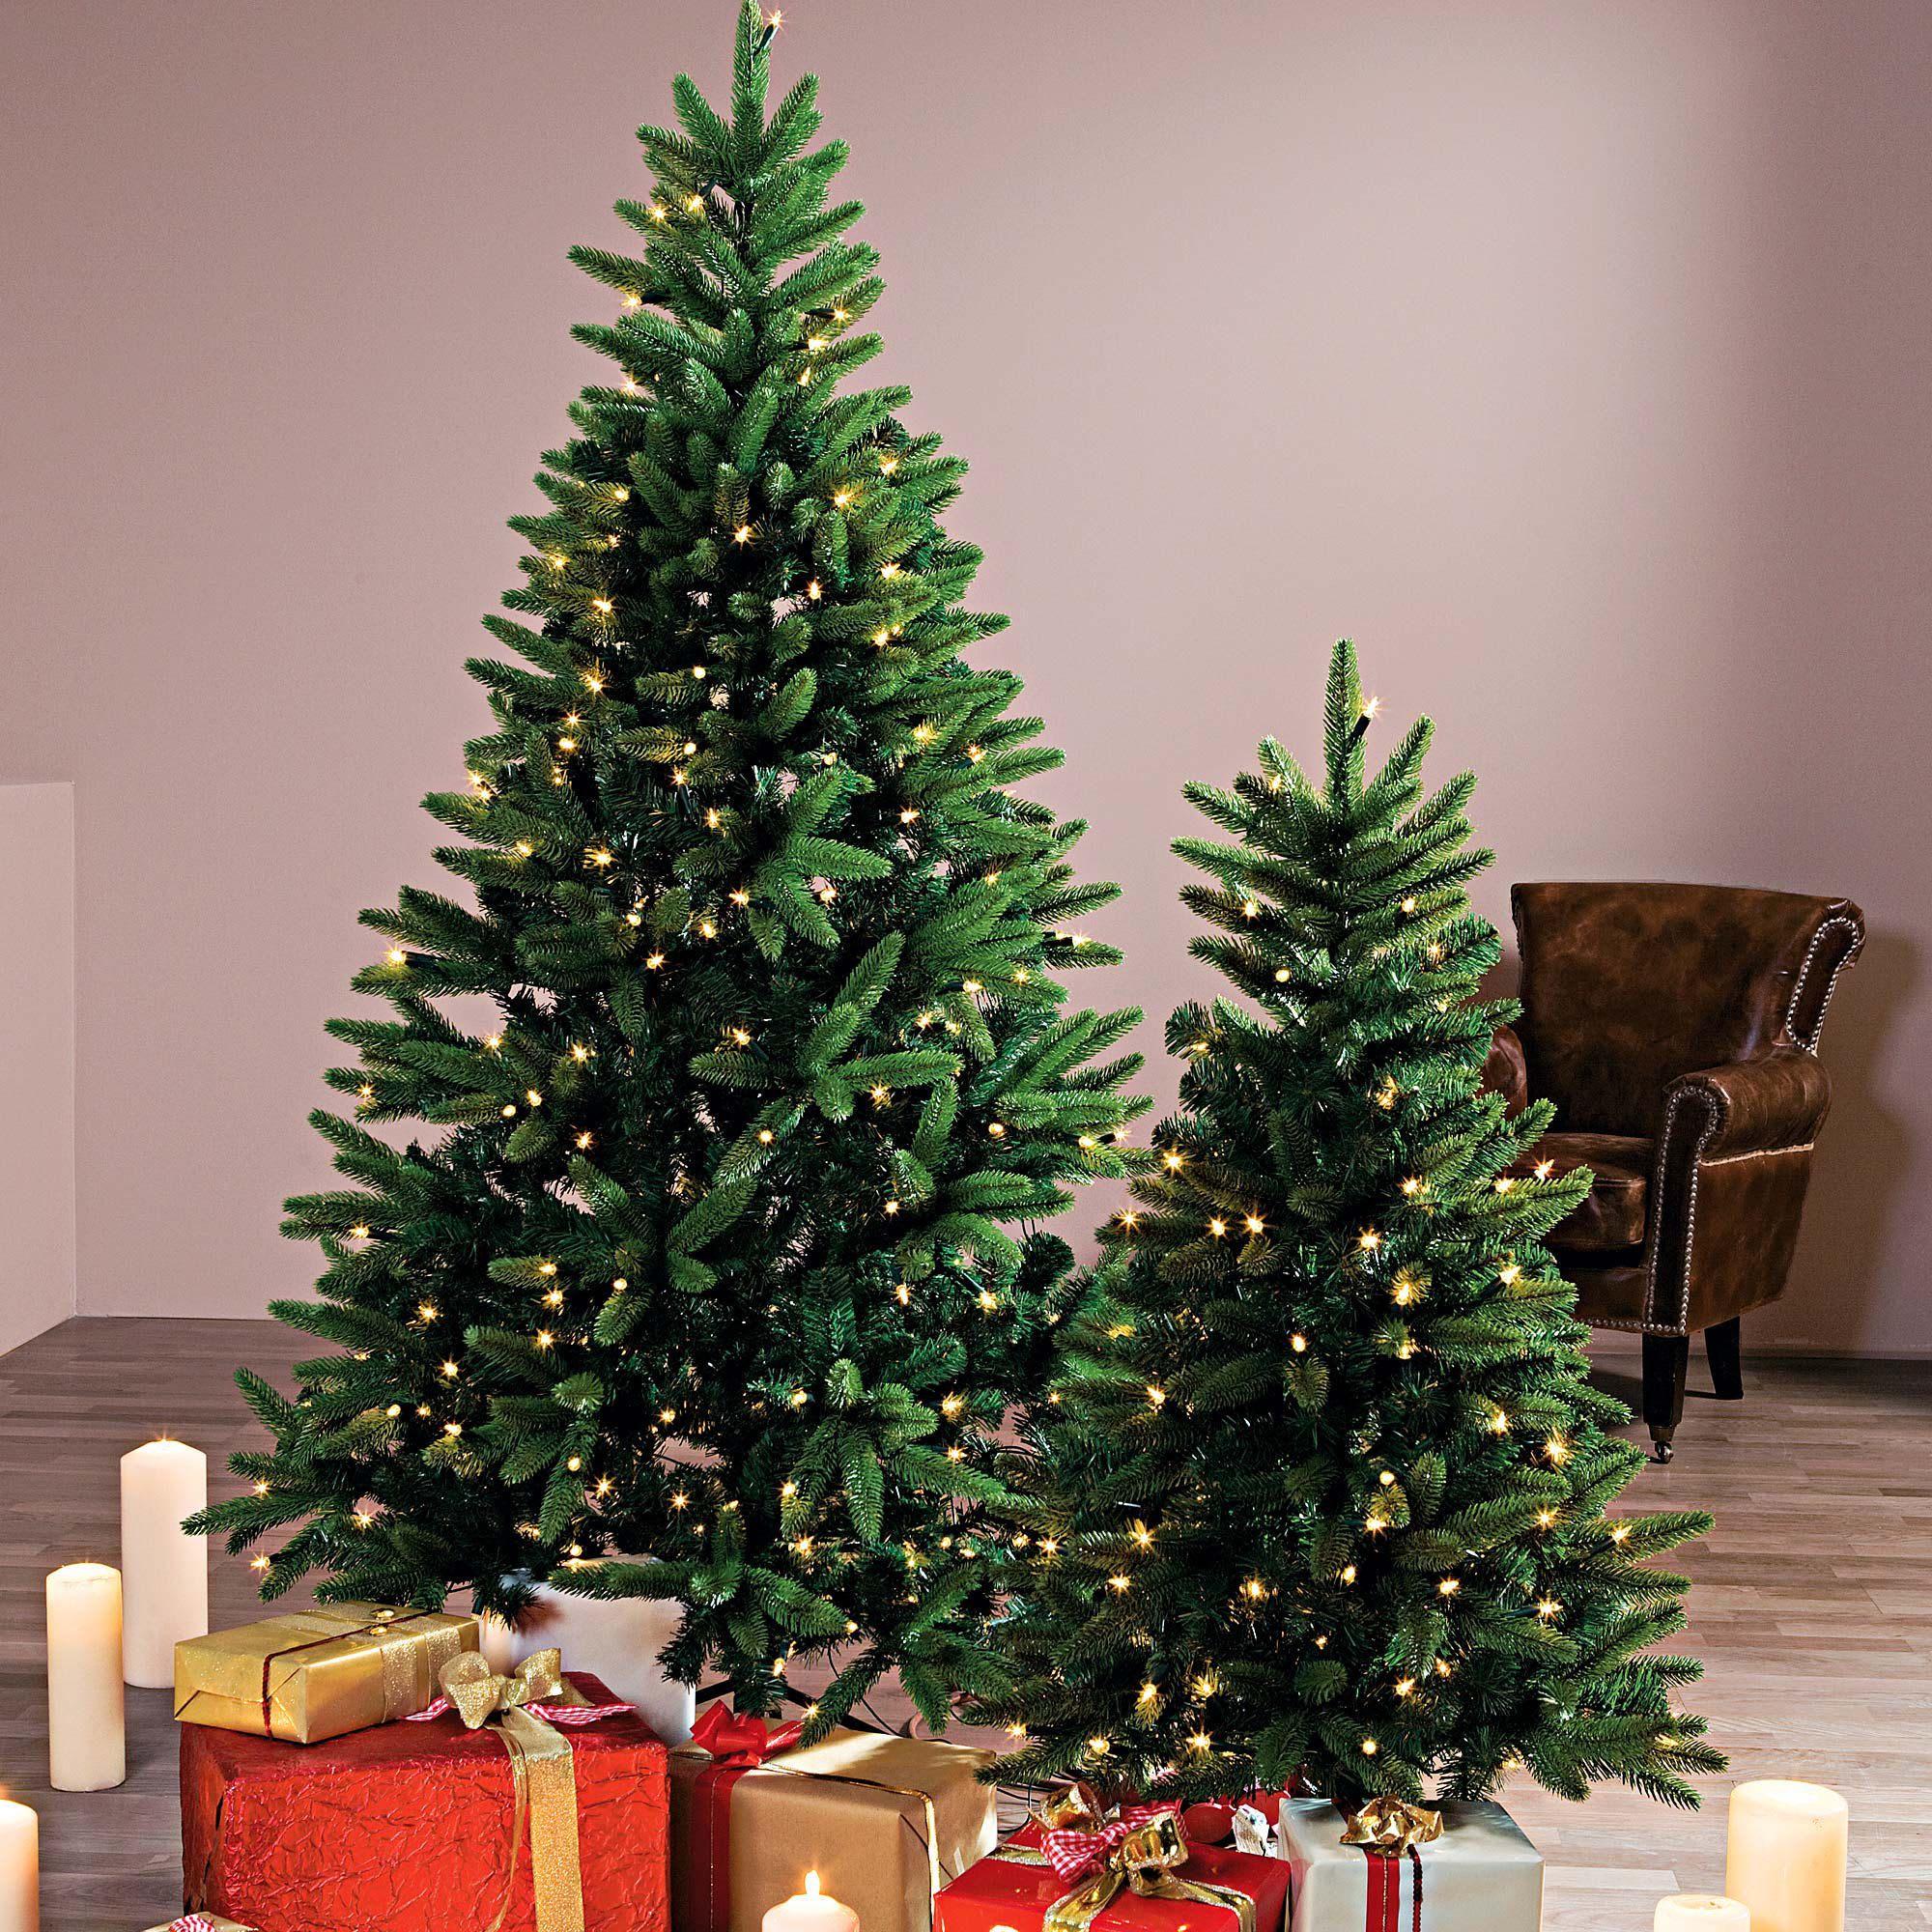 Tannenbaum Beleuchtet Kunststoff.Deko Tannenbaum Beleuchtet Kunststoff Metall Ca H240 Cm